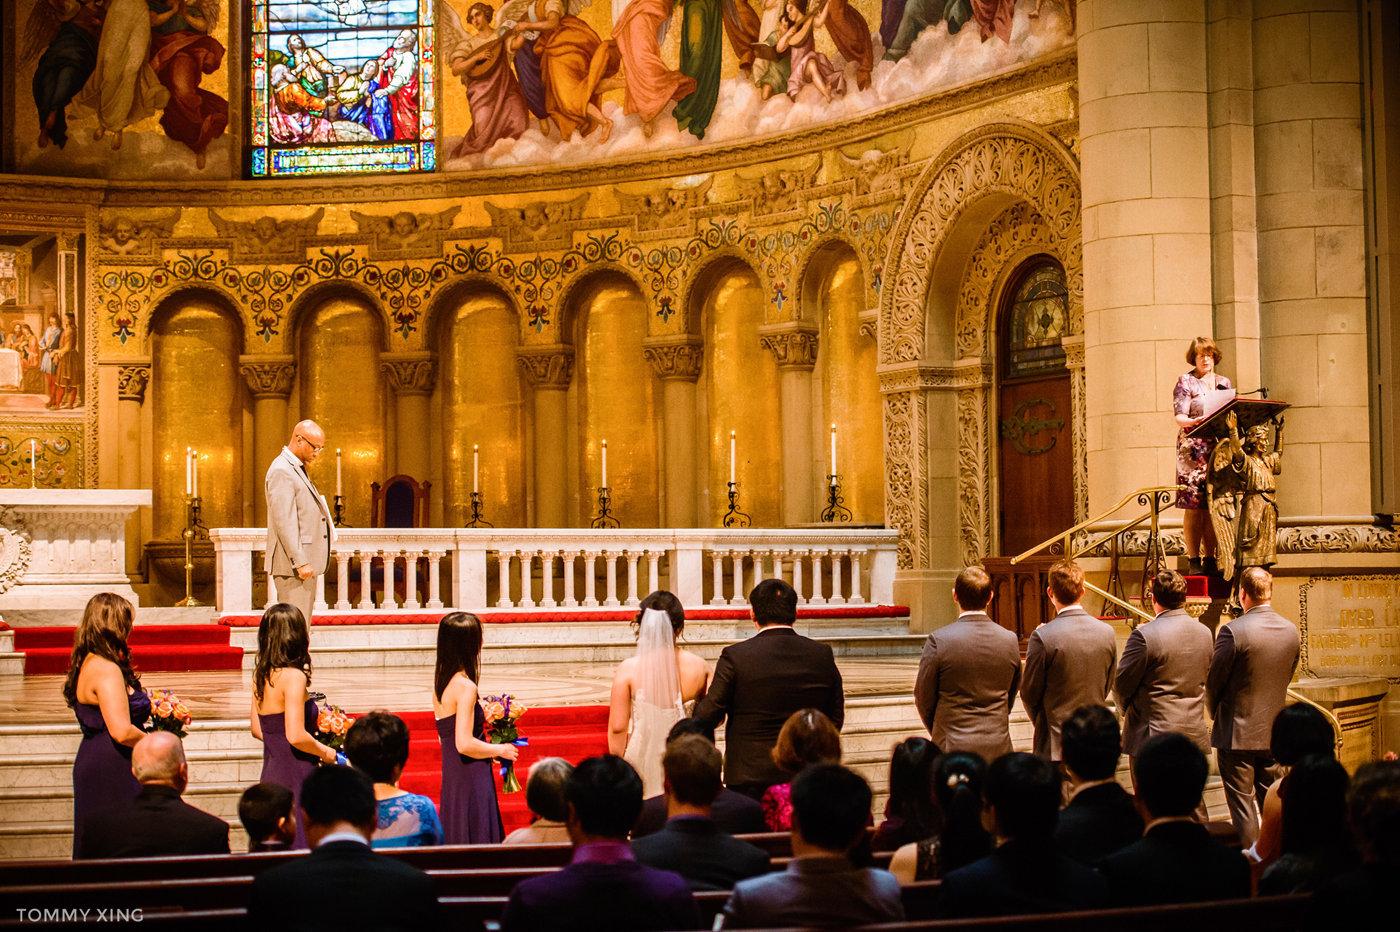 STANFORD MEMORIAL CHURCH WEDDING - Wenjie & Chengcheng - SAN FRANCISCO BAY AREA 斯坦福教堂婚礼跟拍 - 洛杉矶婚礼婚纱照摄影师 Tommy Xing Photography090.jpg